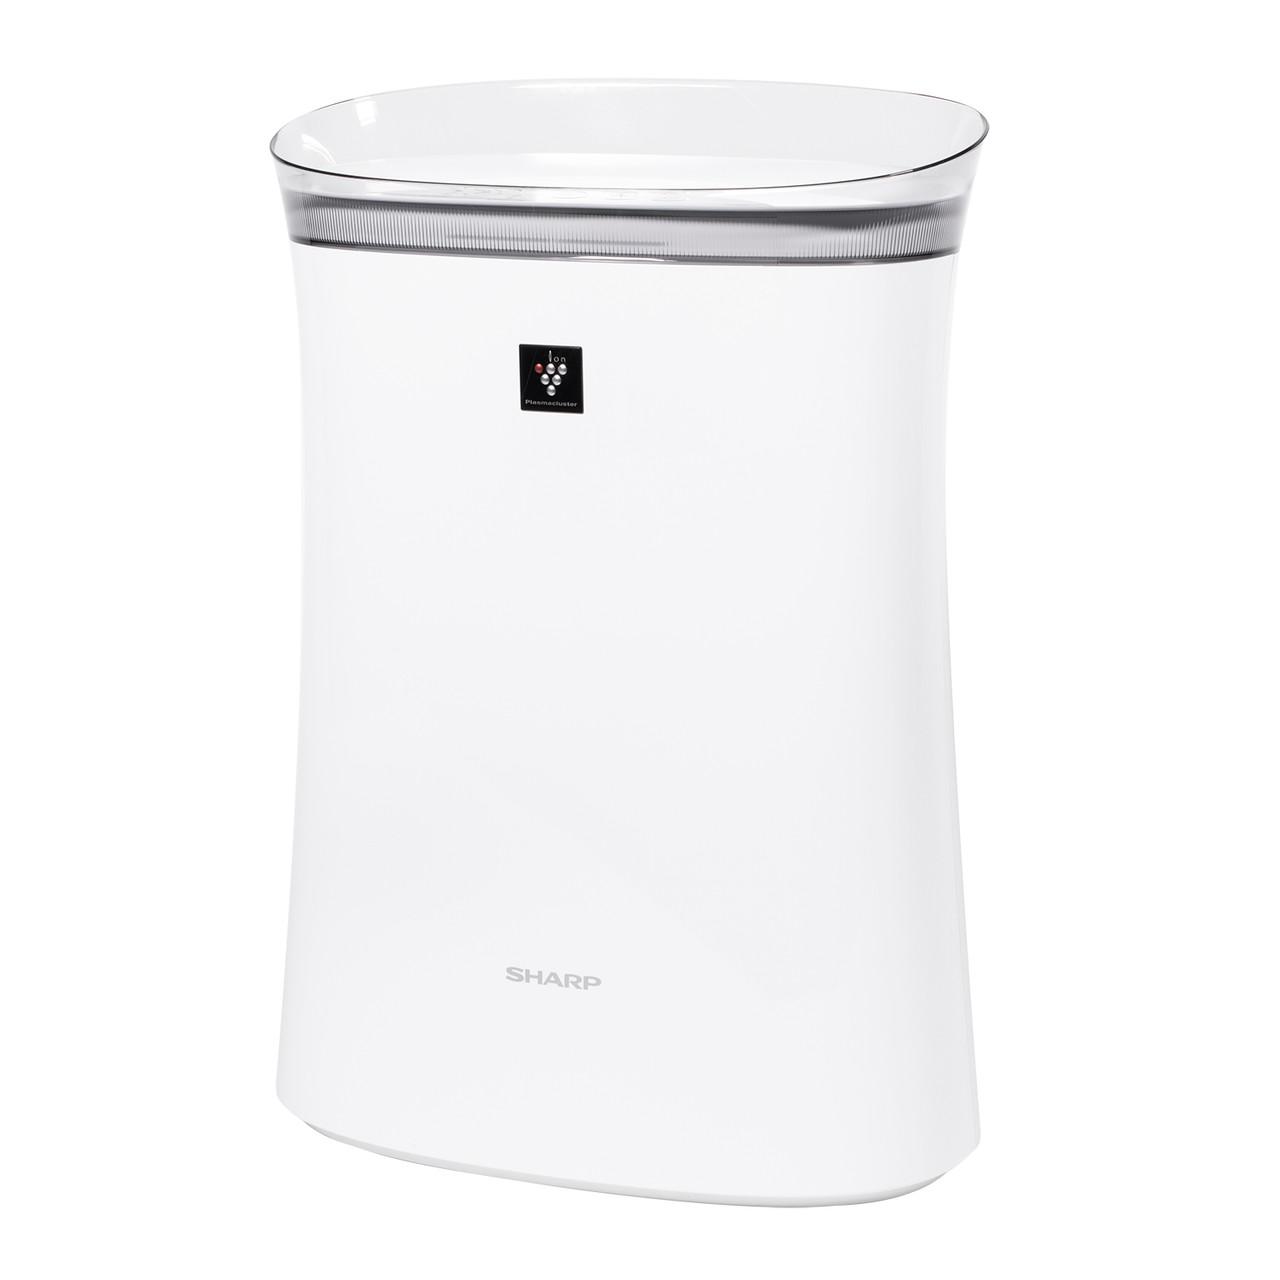 Sharp True HEPA Air Purifier for Medium-Sized Rooms (FPK50UW) – left side view